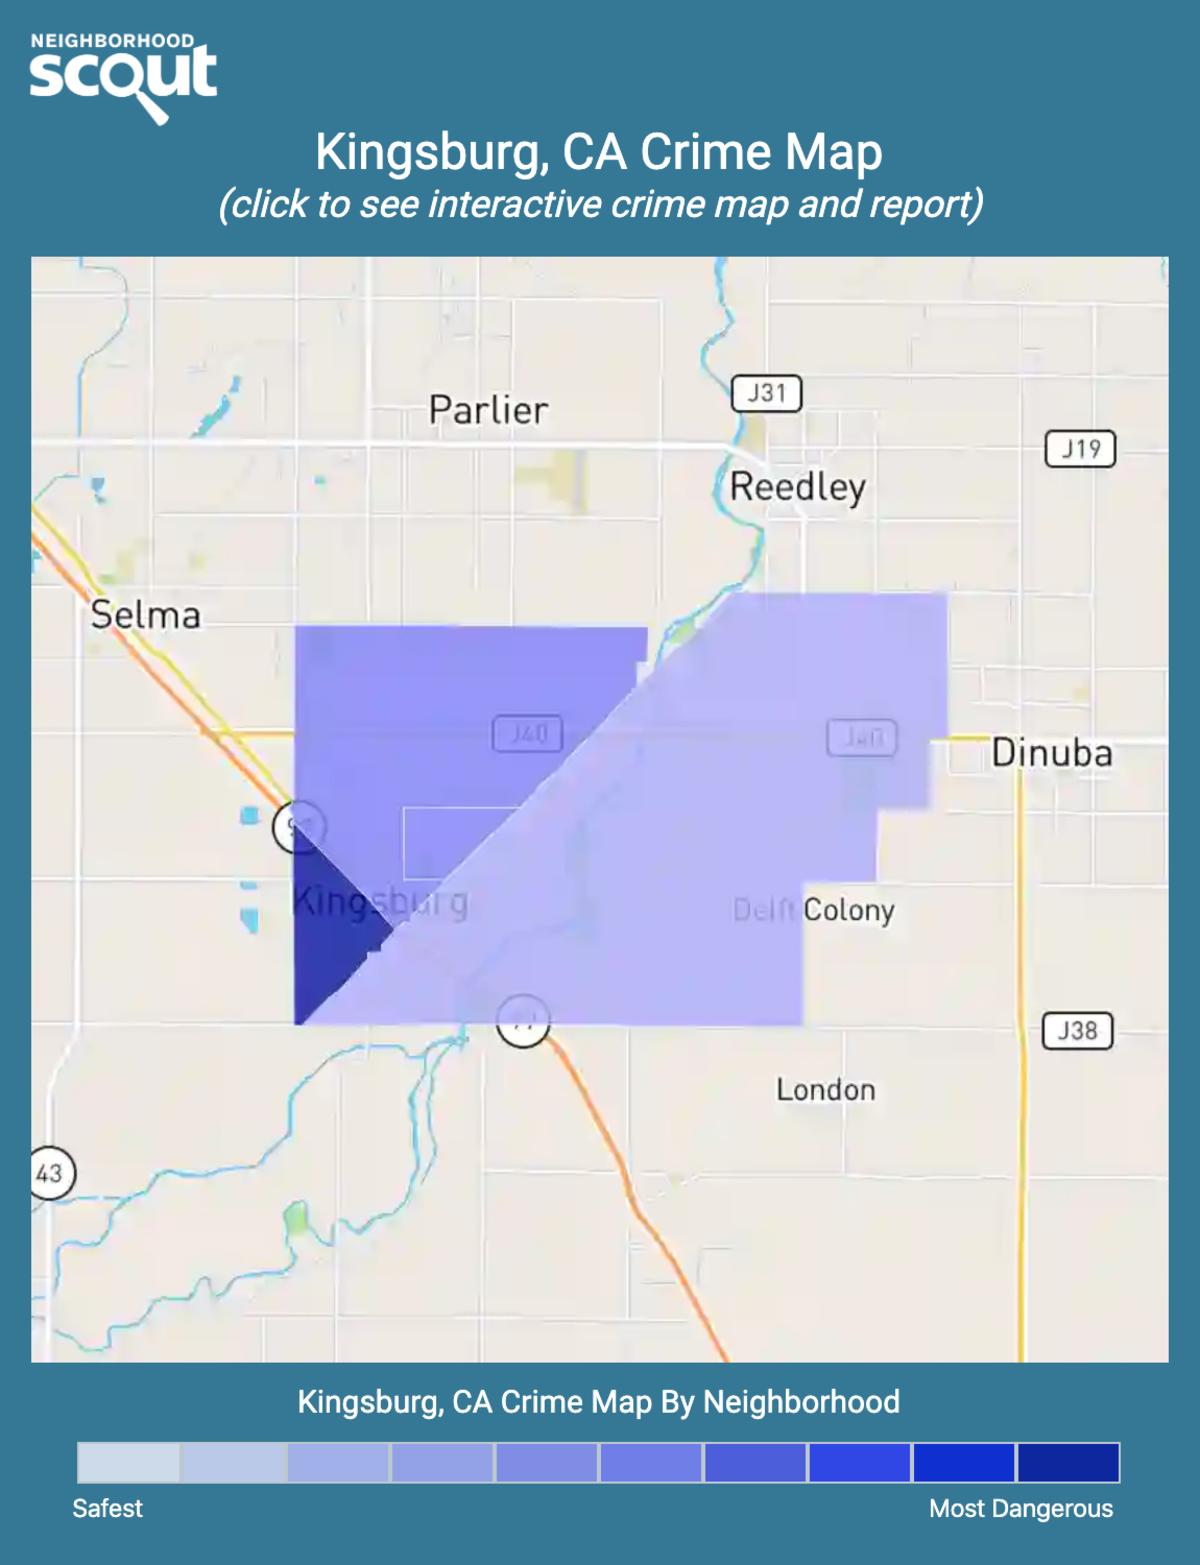 Kingsburg, California crime map